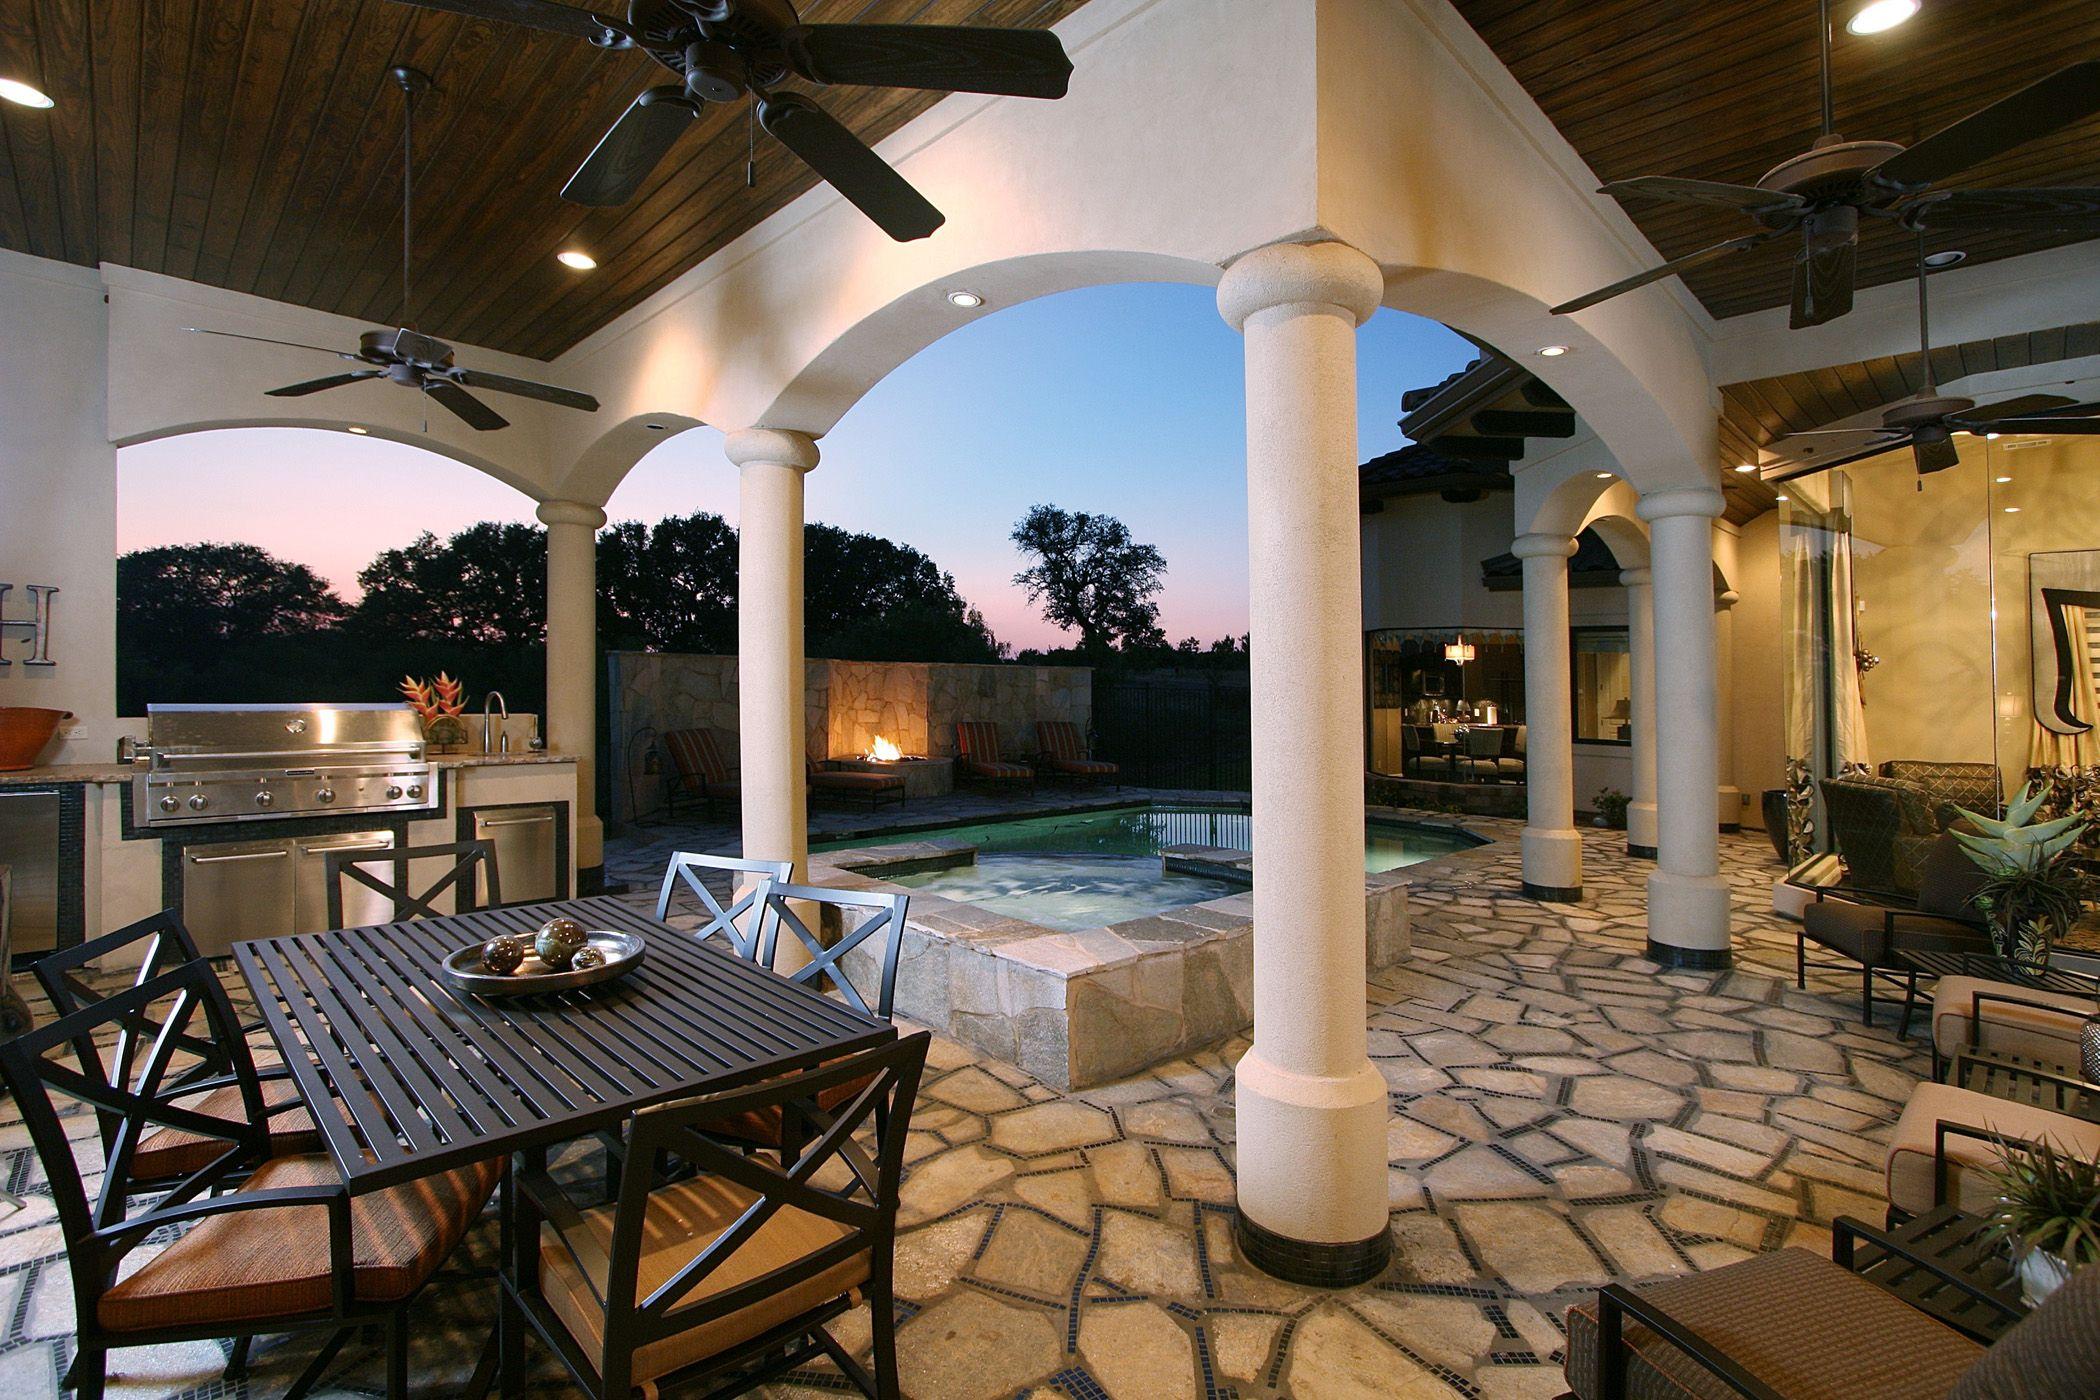 Outdoor Living | Fancy houses, Outdoor living luxury ... on Fancy Outdoor Living id=61062